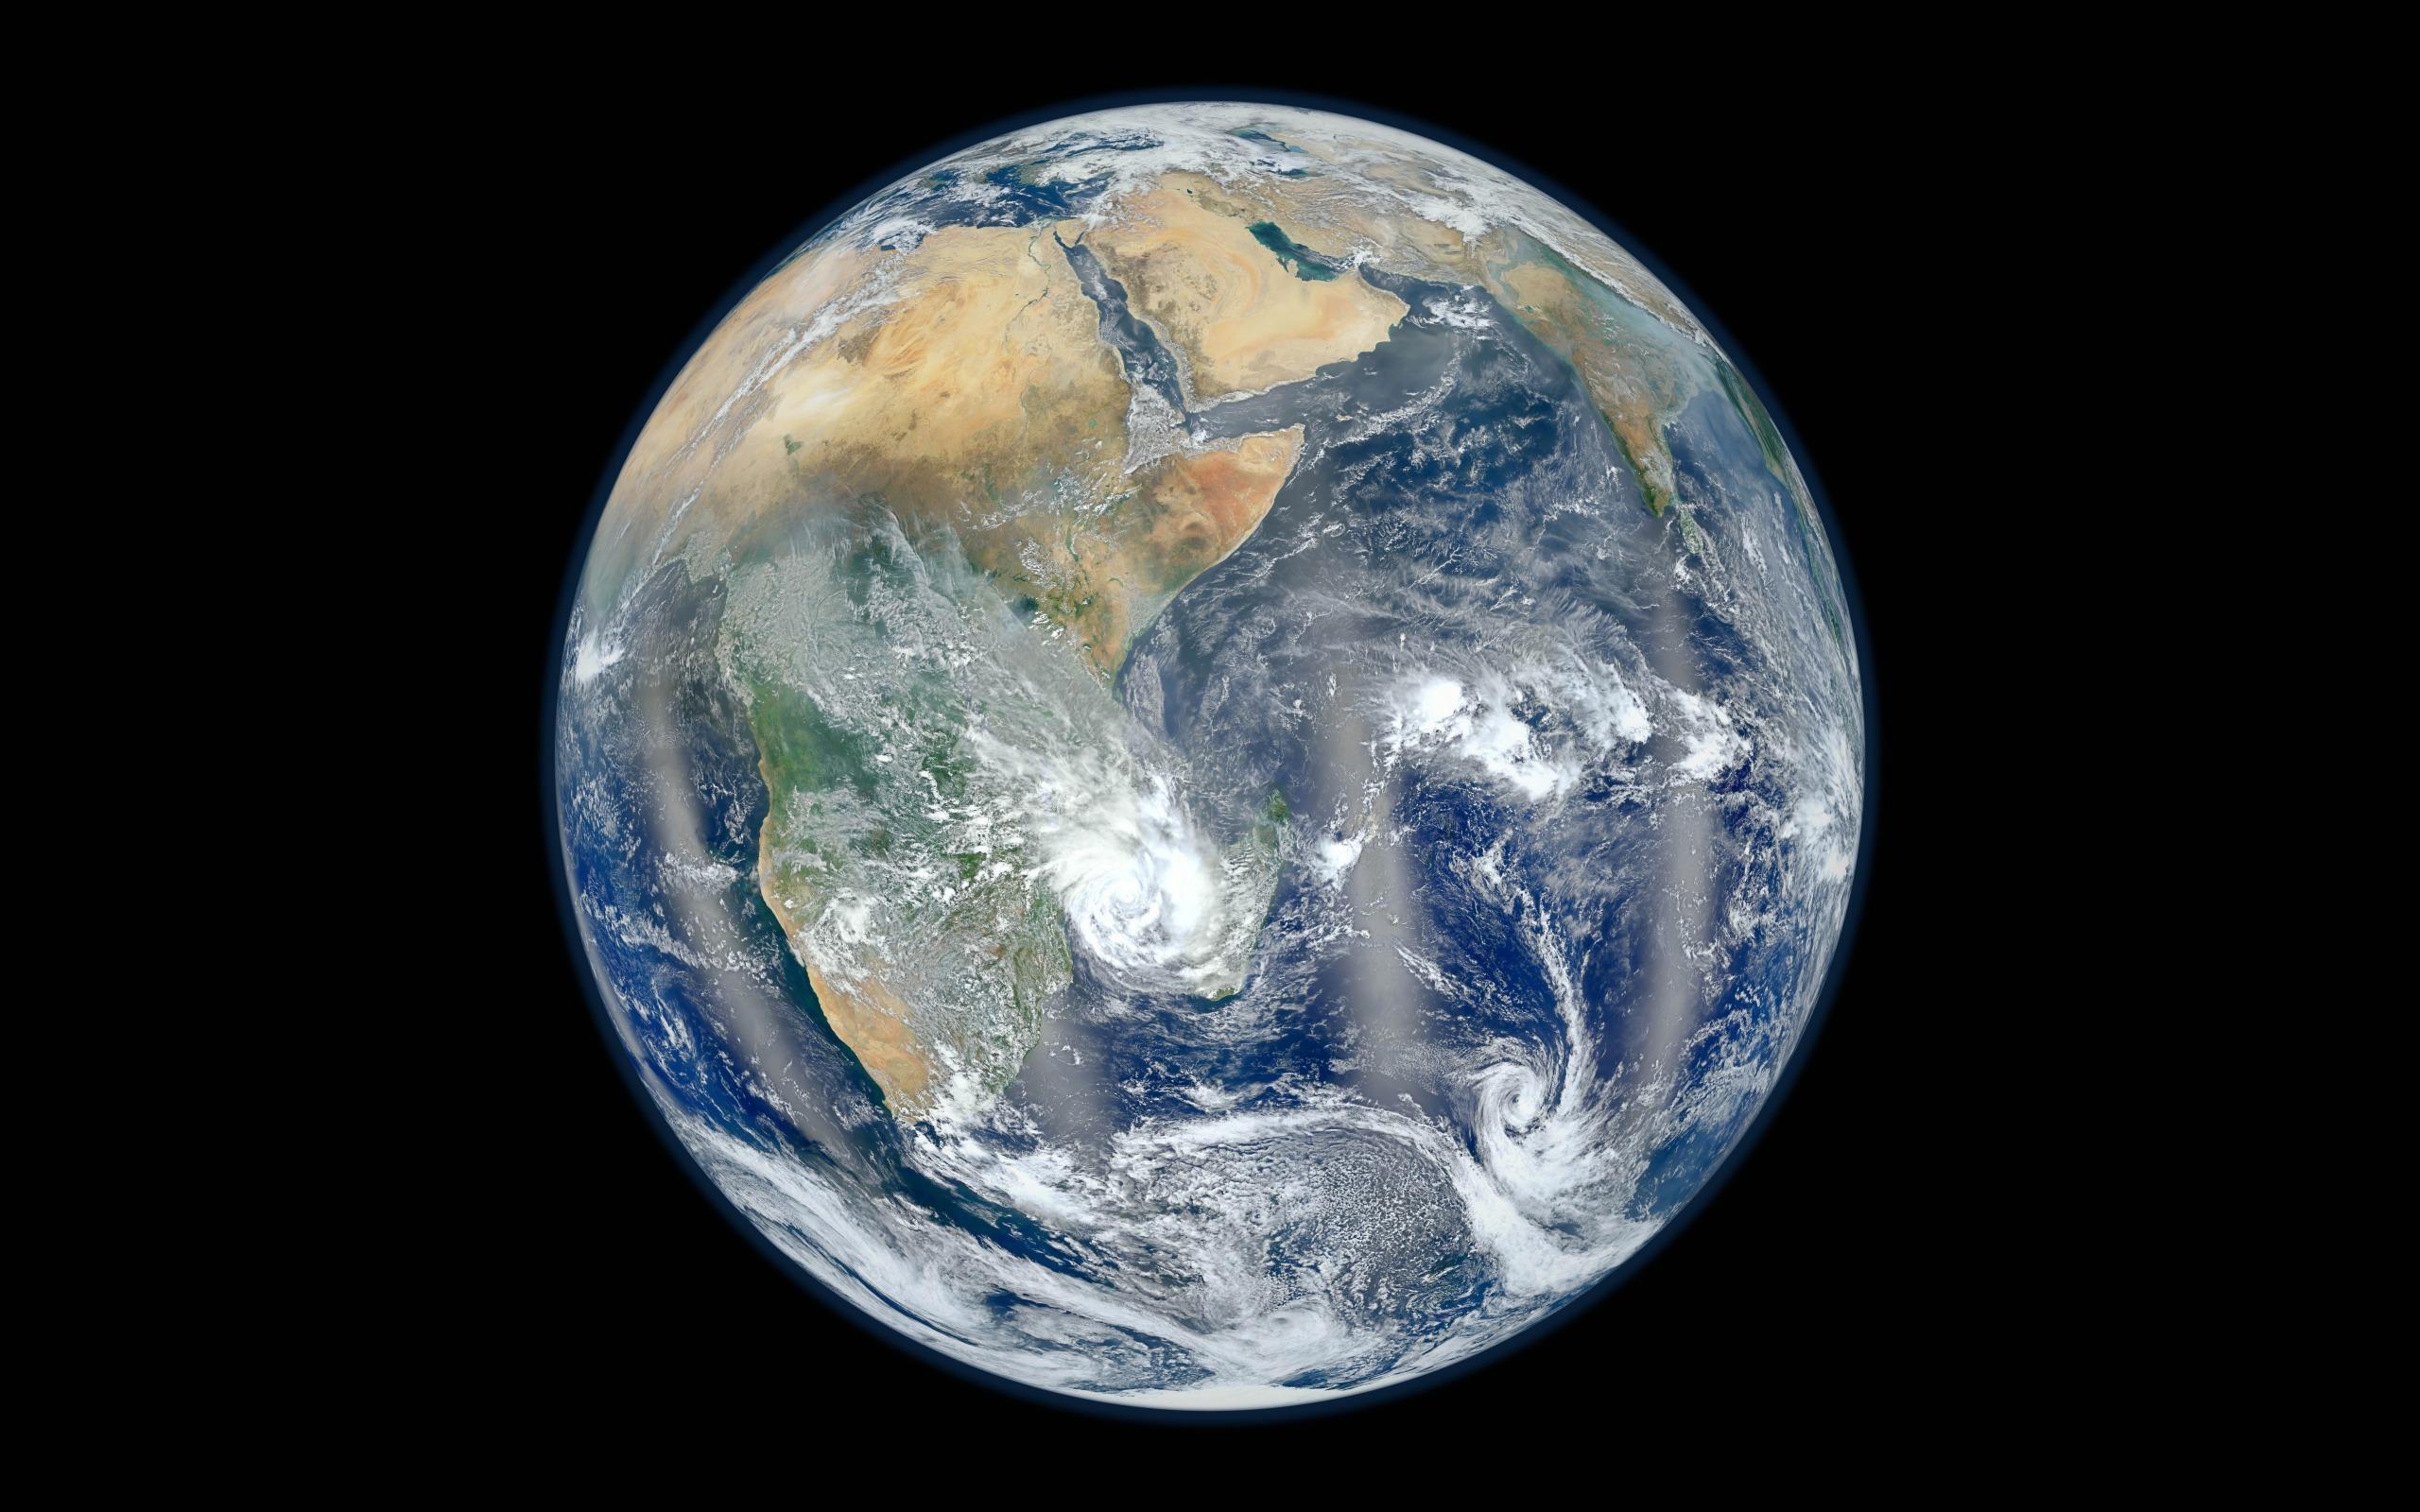 HDoboi.Kiev.ua - Планета земля из космоса, iphone 7 обои космос